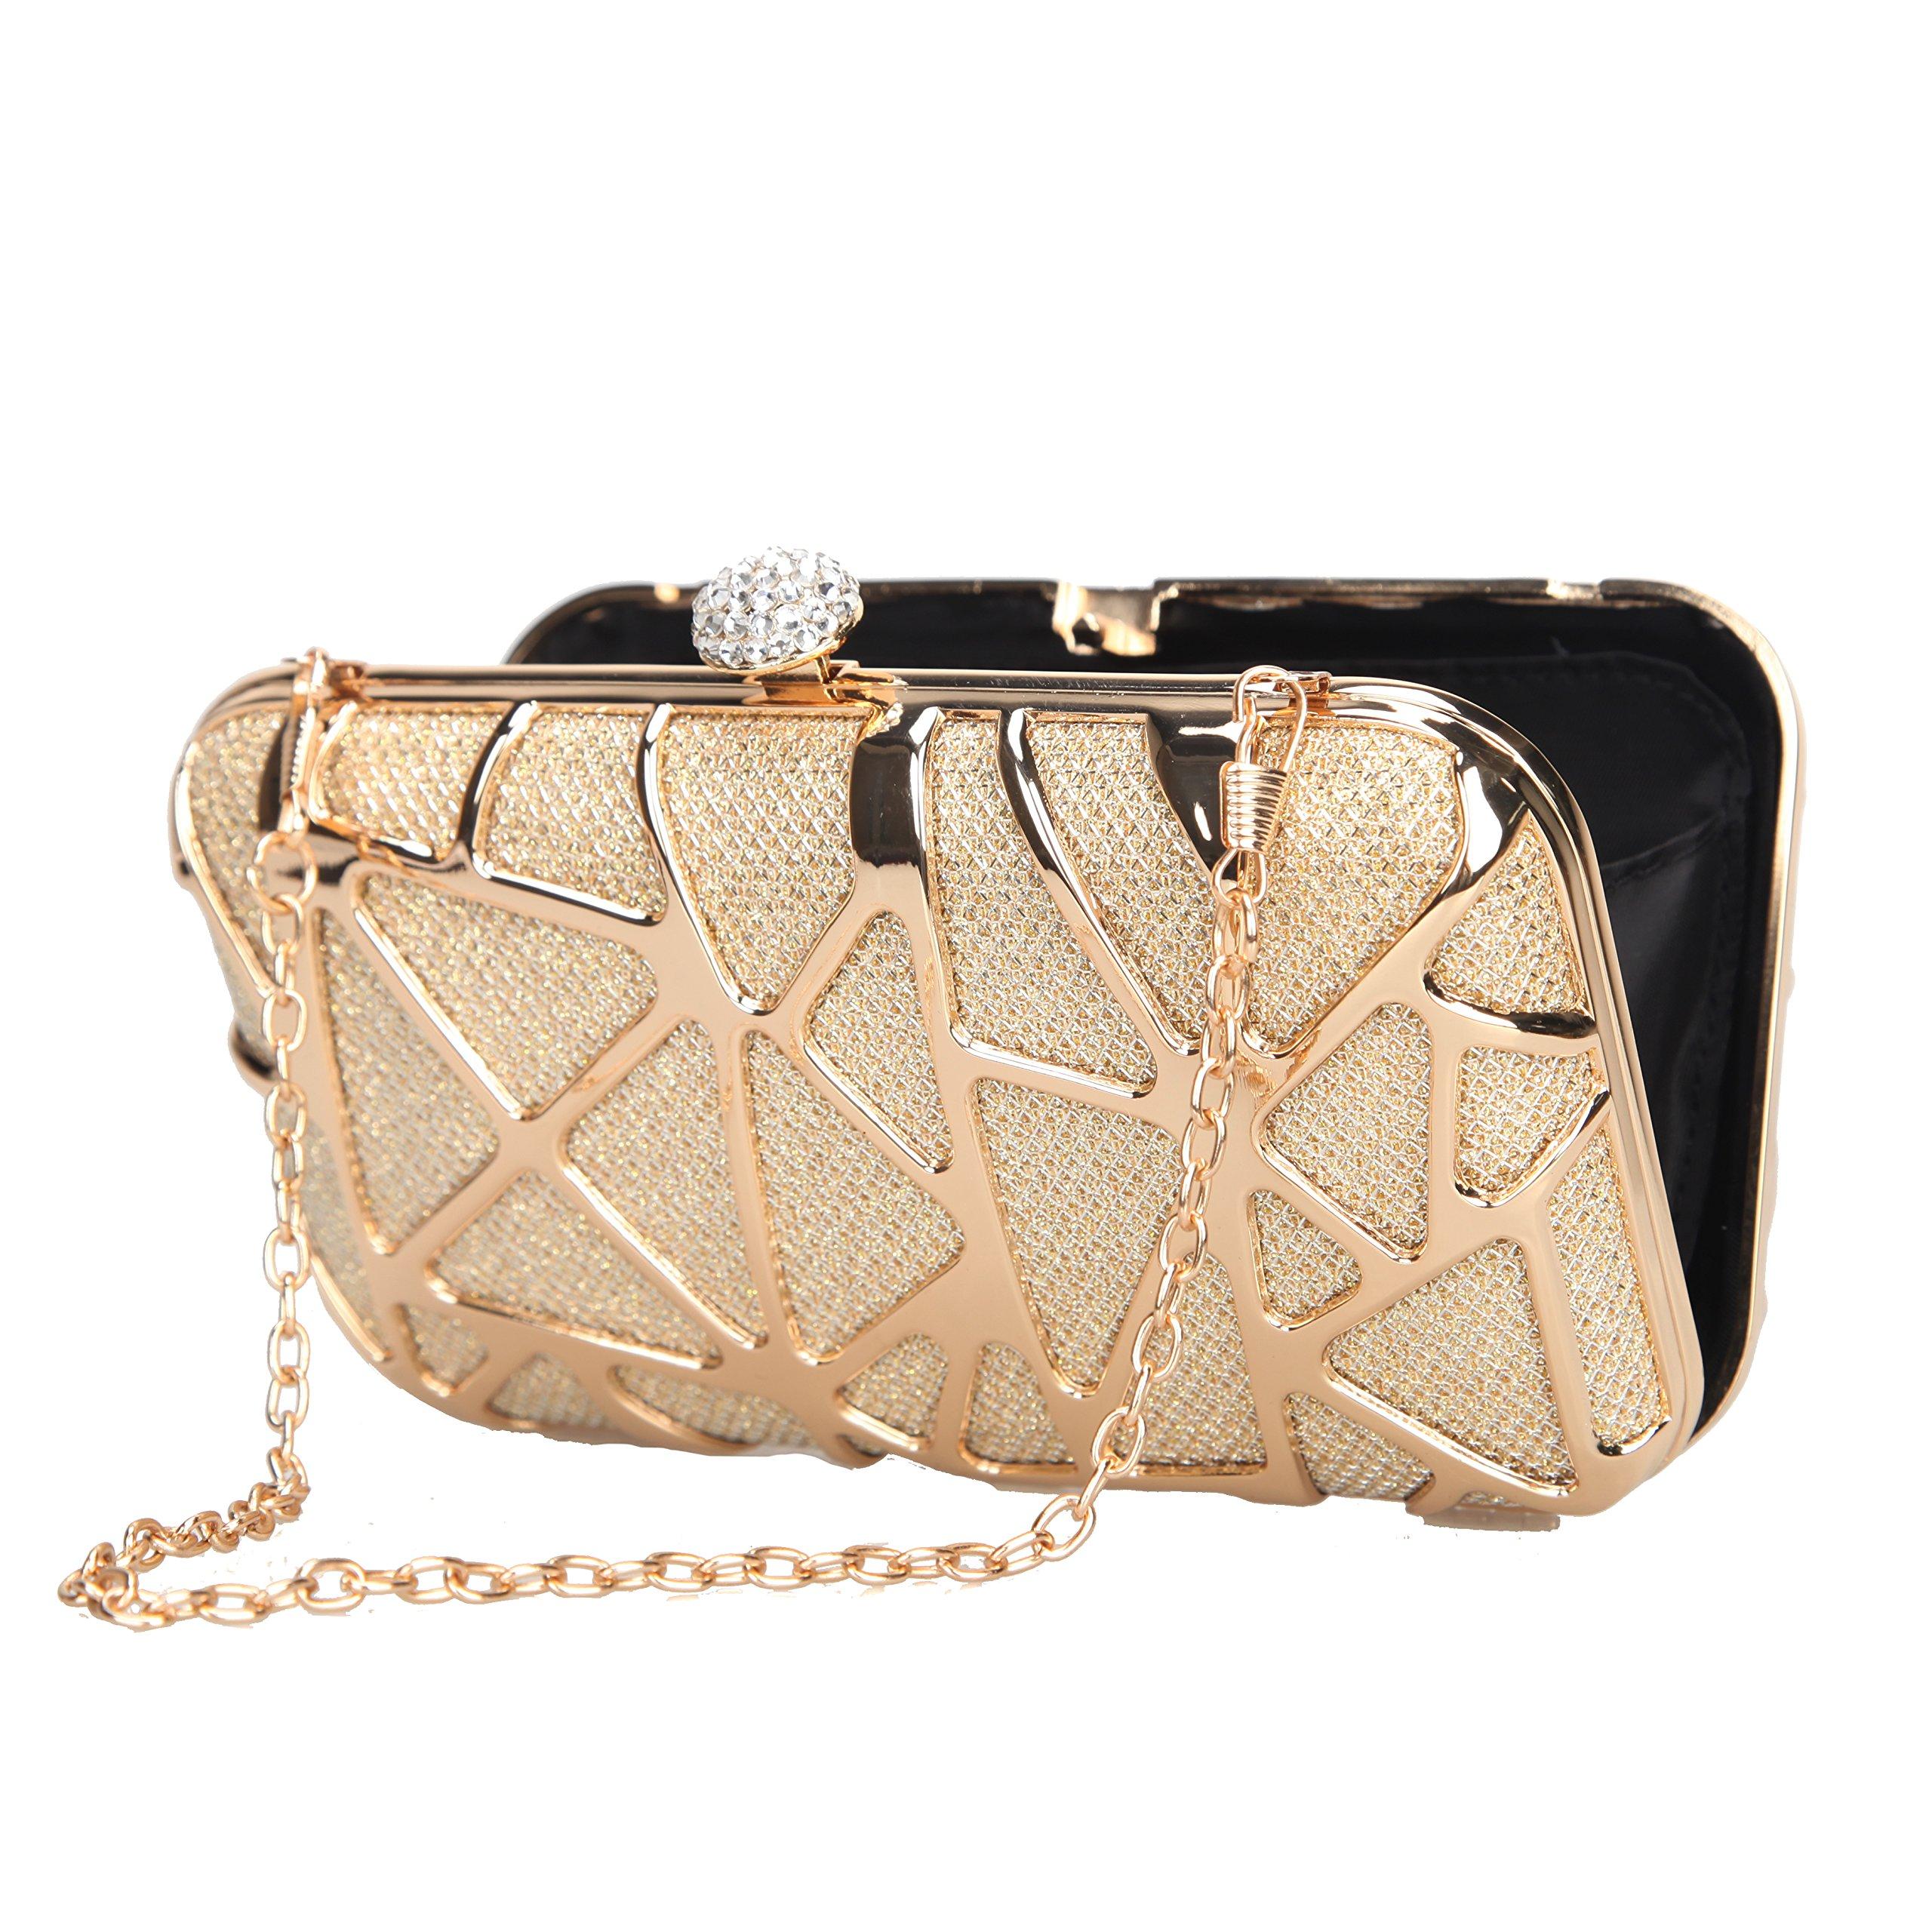 Fawziya Water Cube Mini Glitter Box Purse Fashion Clutch Bags For Women  Evening Bags-Gold - E1417   Departments   Clothing b095cadfdcbe